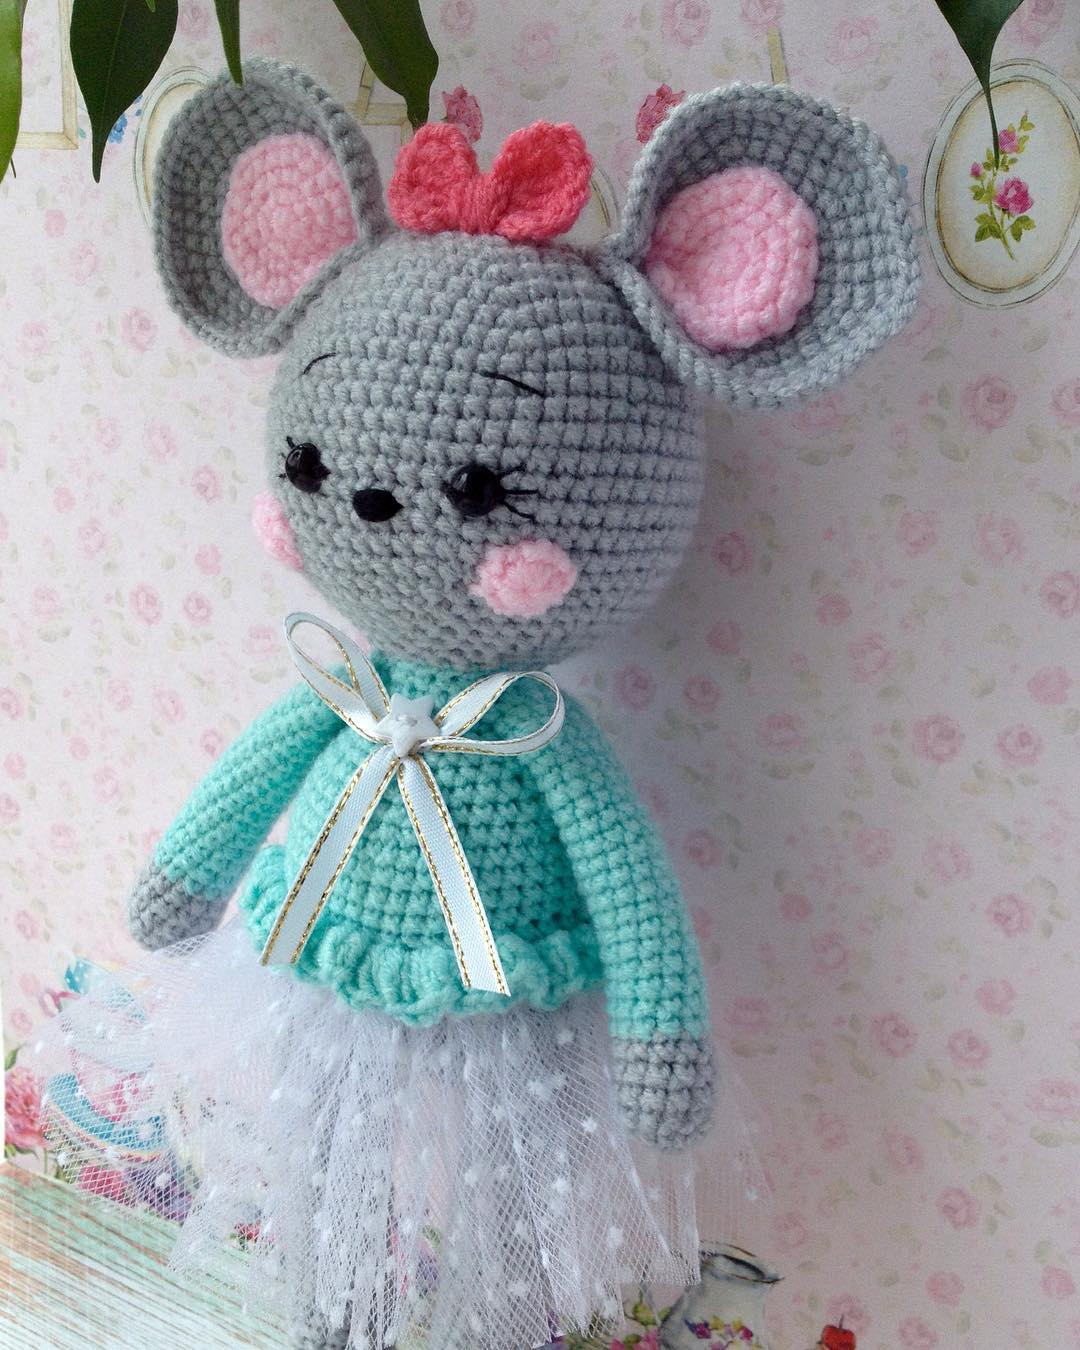 Crochet mouse amigurumi pattern